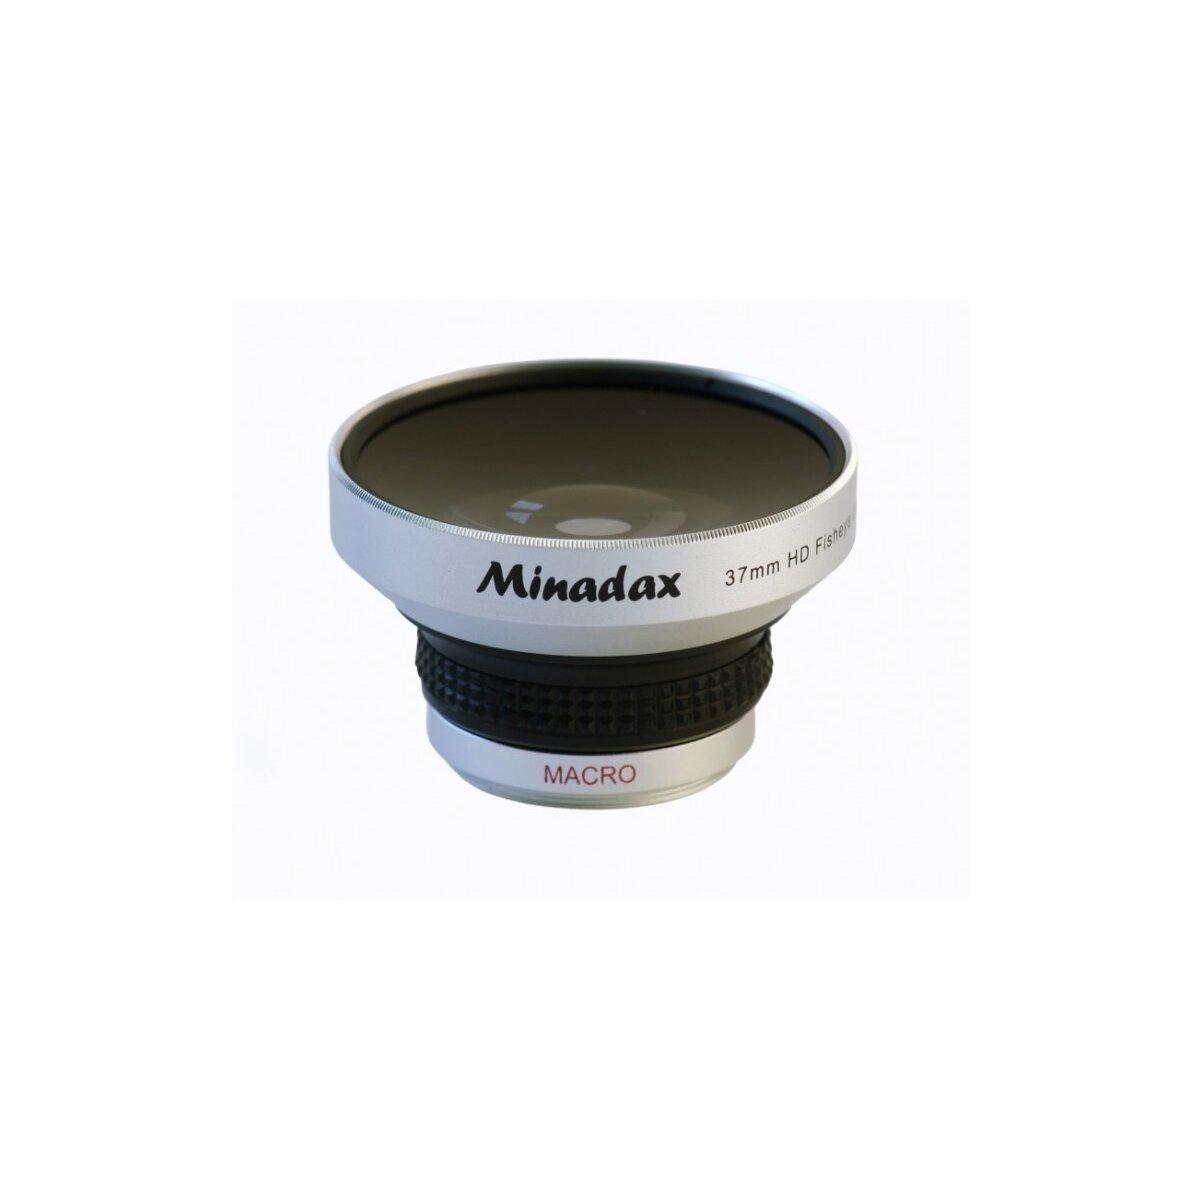 Minadax 0.25x Fisheye Vorsatz kompatibel mit Canon HV10, HR10, HF10, HF11, HG20, HG21, DC40, DC50, HF100, LEGRIA HF20, LEGRIA HF21